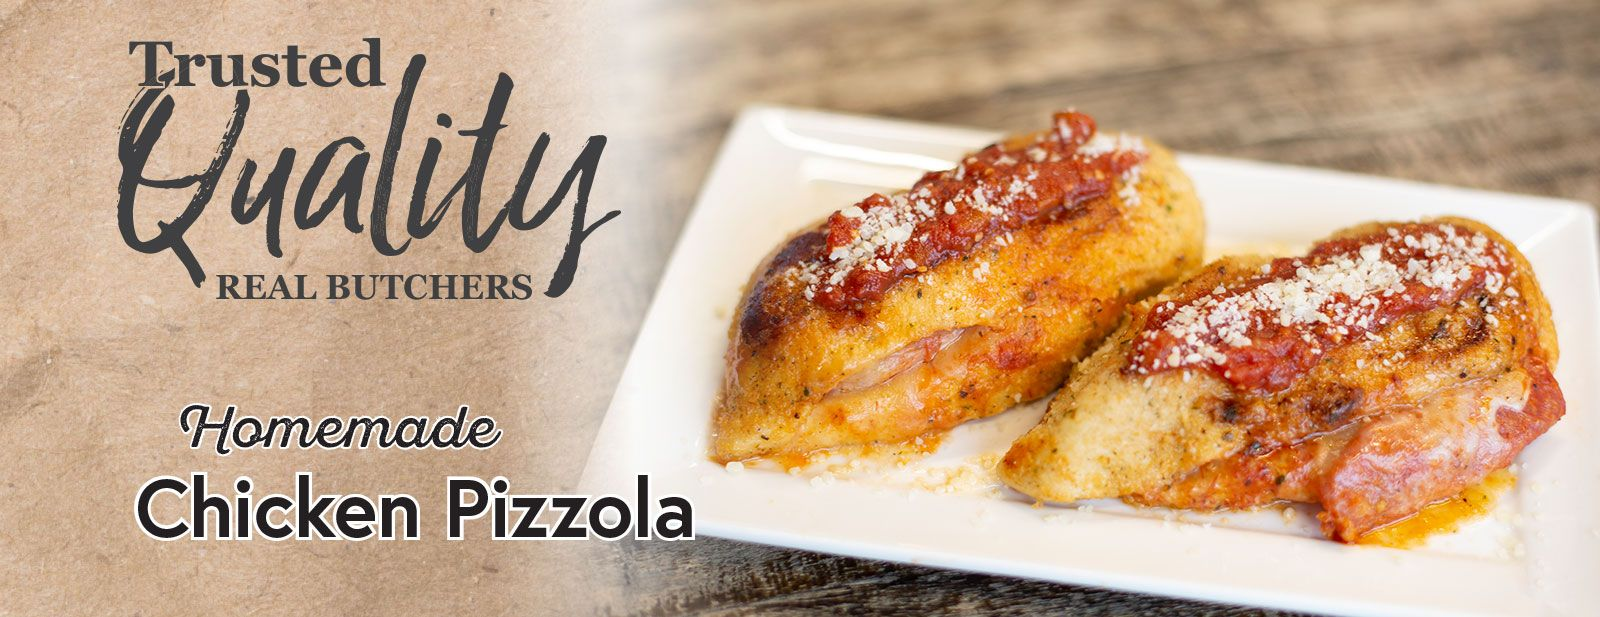 Homemade Chicken Pizzola